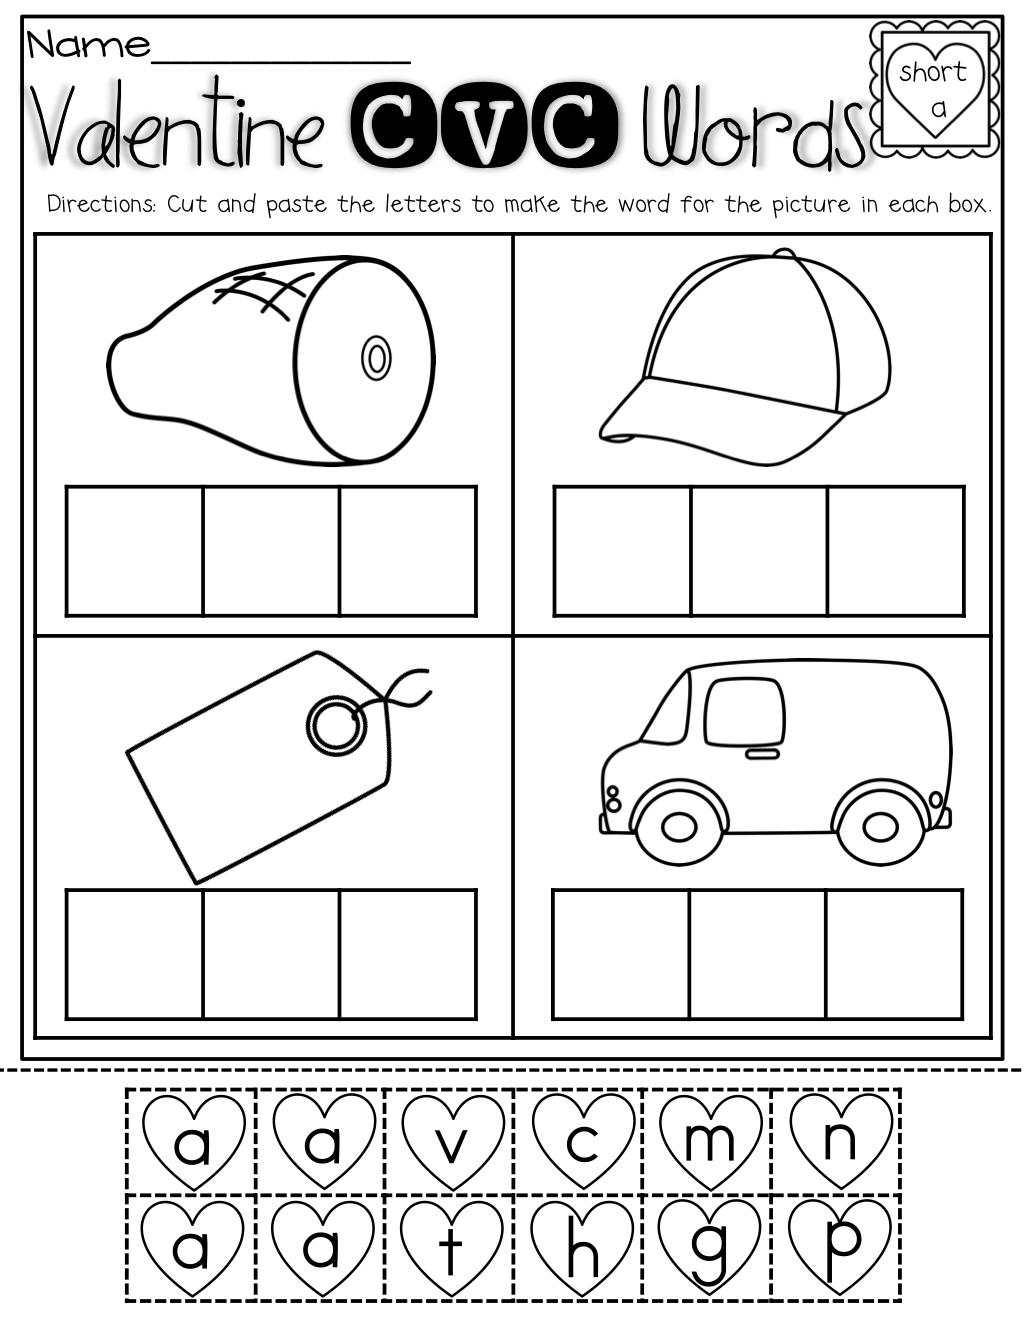 worksheet Free Cvc Worksheets february no prep packet kindergarten school and cvc words cut paste for valentines